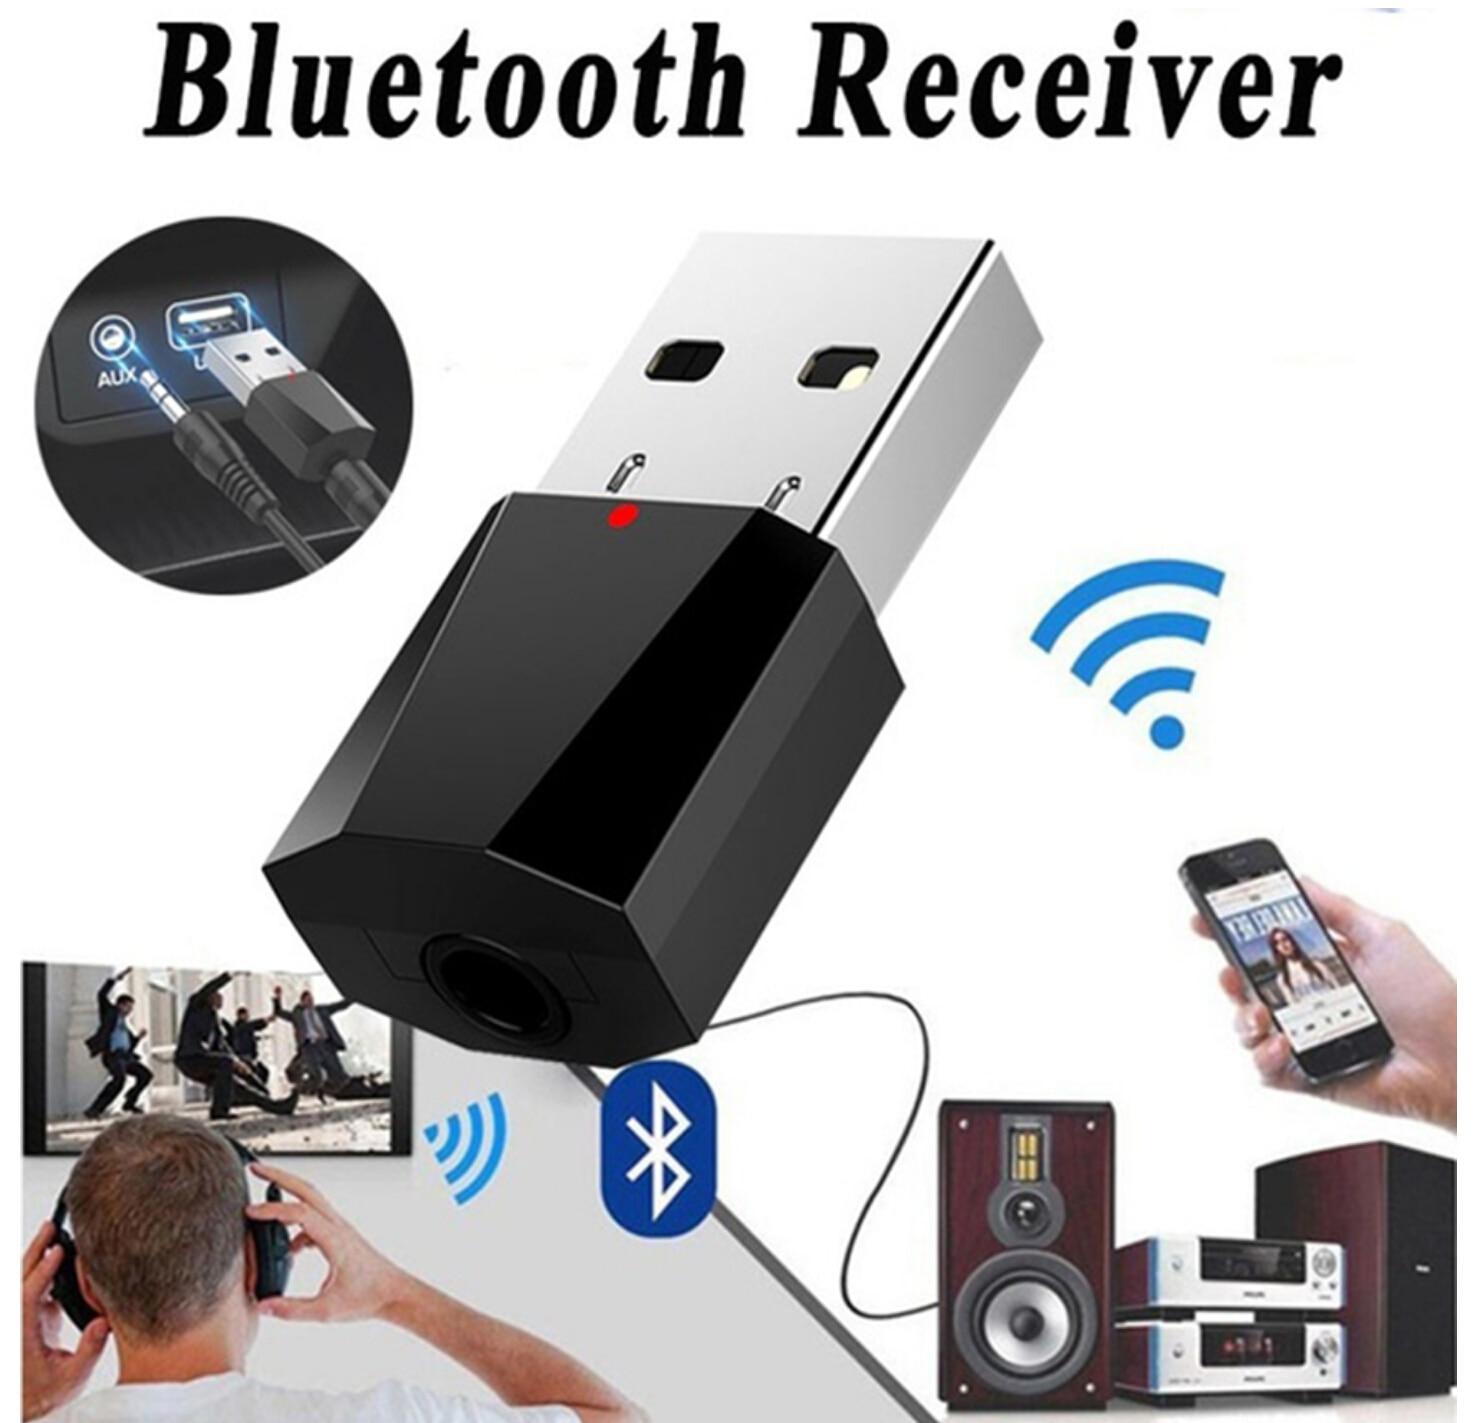 2019 inalámbrico USB AUX Mini receptor Bluetooth para INFINITI EX FX JX QX X25 EX35 FX G25 G35 G37 ESQ QX50 QX60 QX70 QX80 Q50 Q60